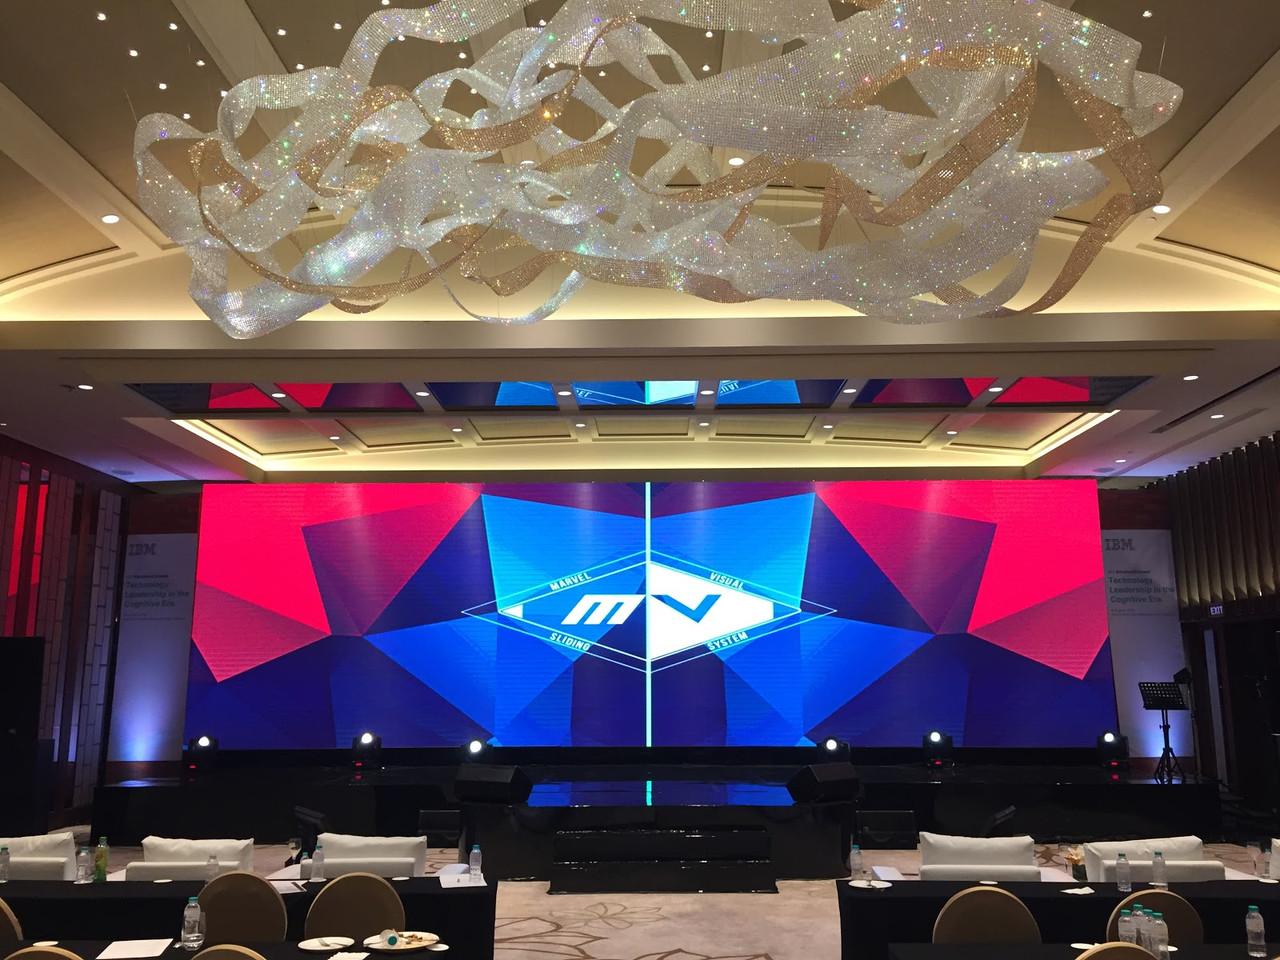 LED экран SMD Р-3 INDOOR, размер 6,336м*3,456м-21,89кв.м (576мм*576мм) АРЕНДНЫЙ